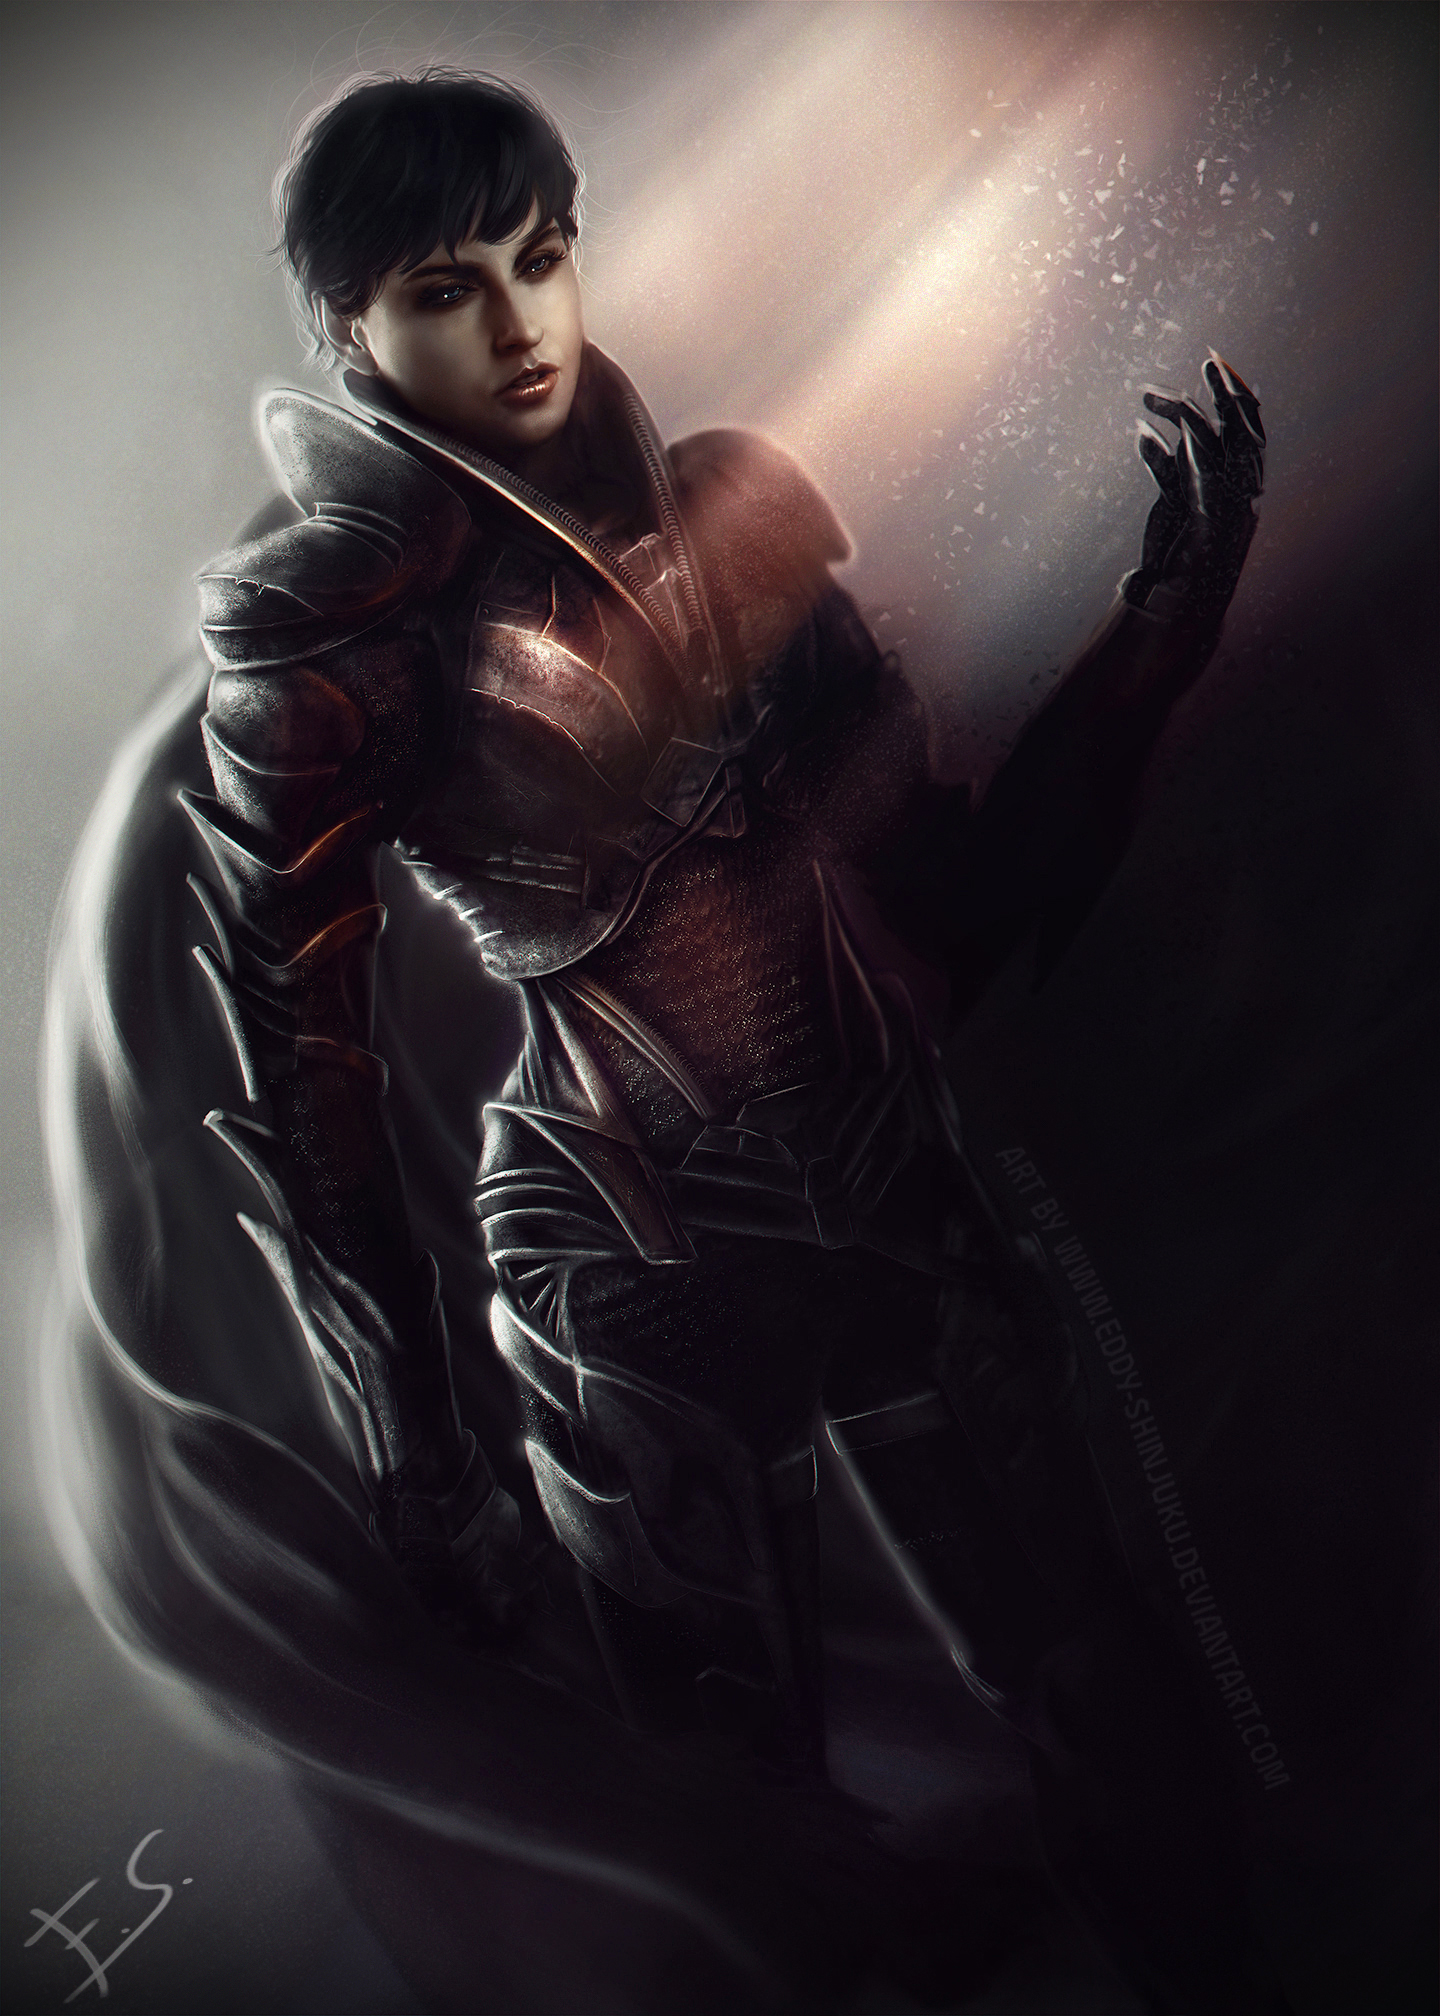 FAORA UL: Man of Steel Edition